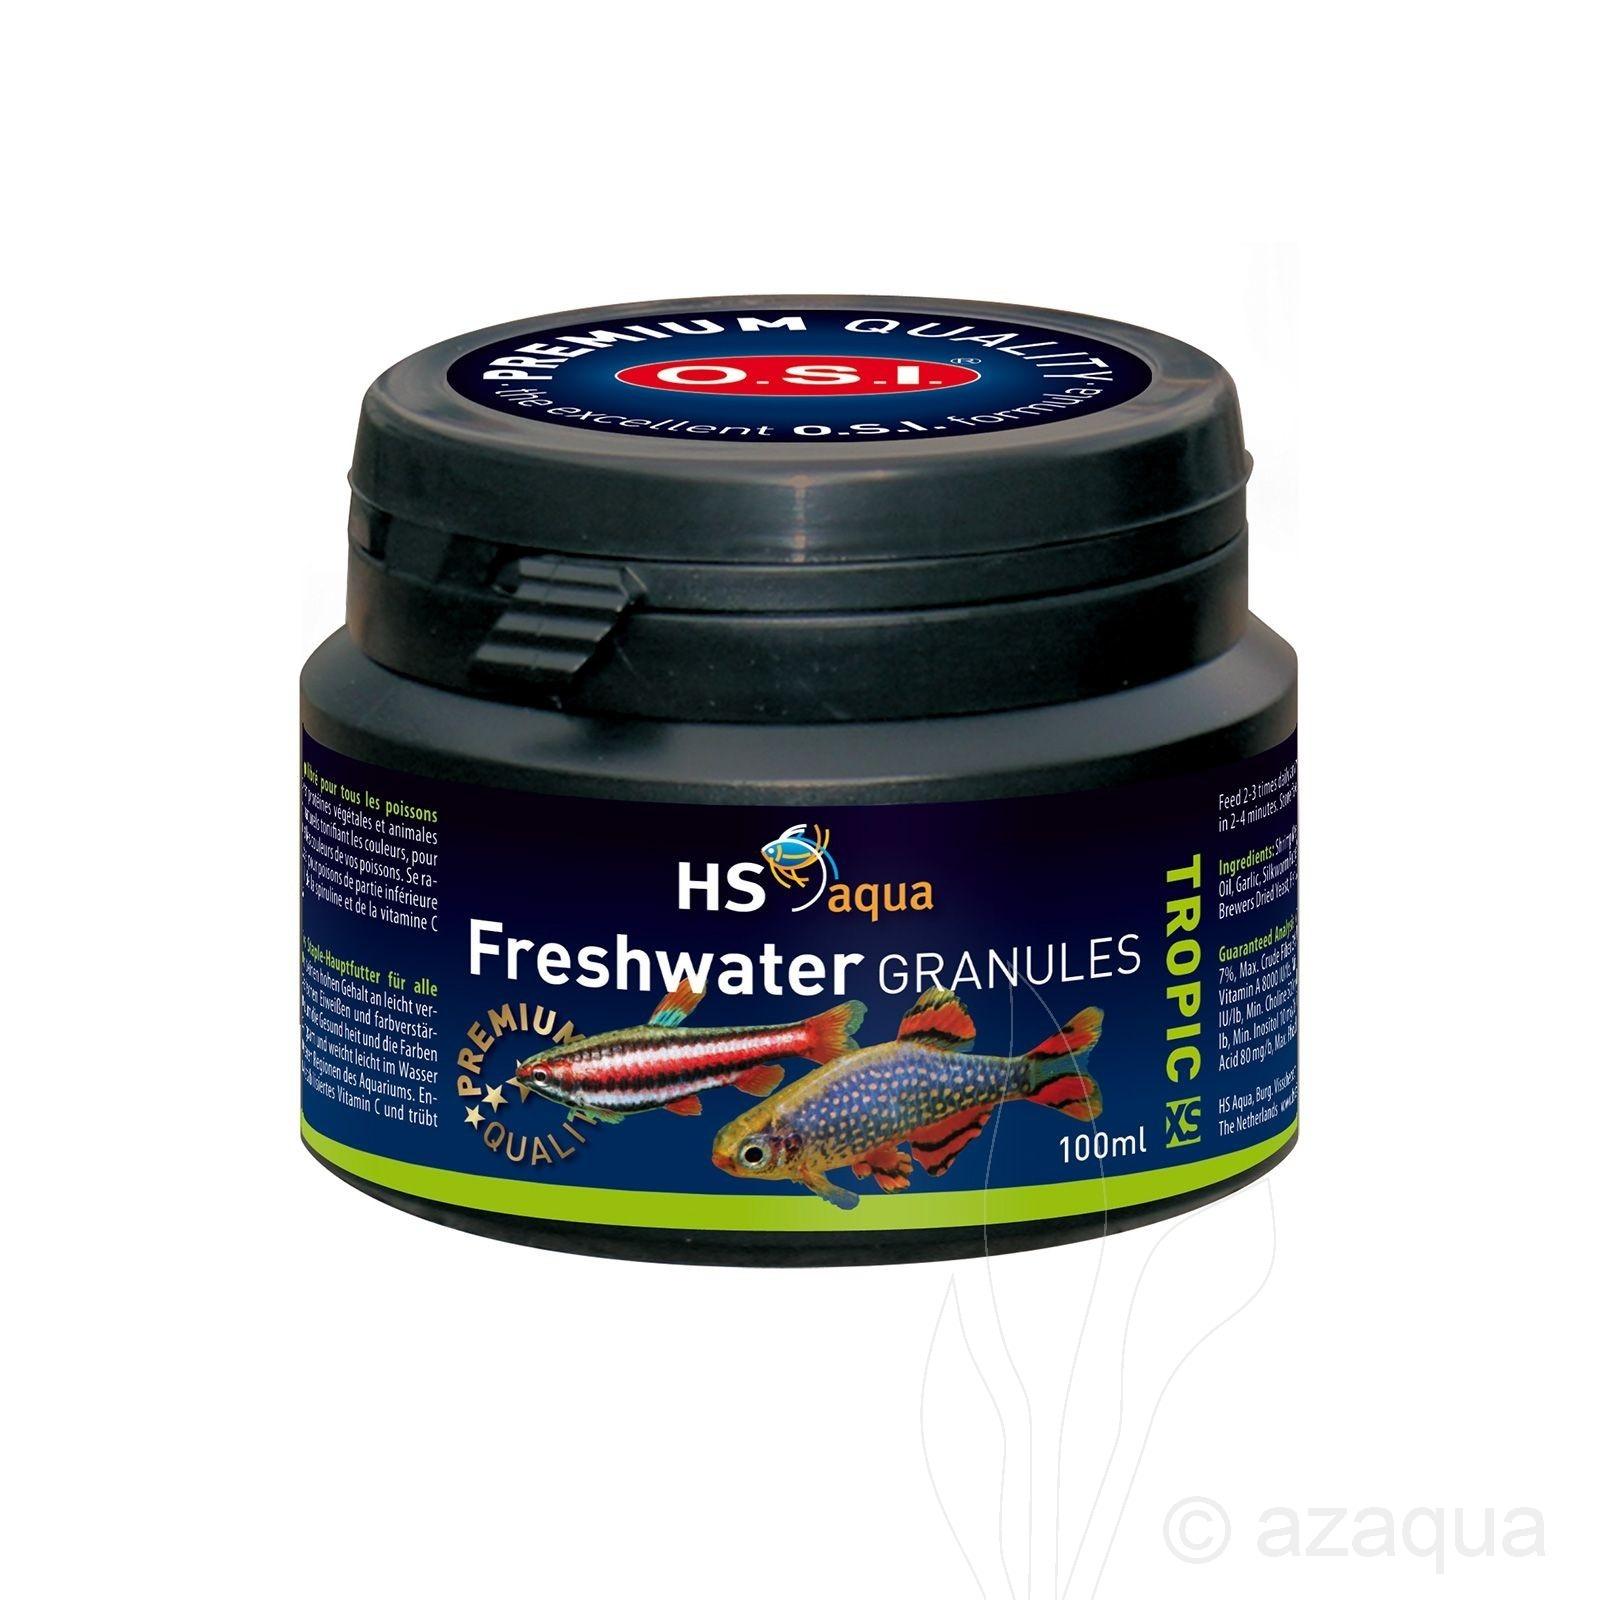 HS Aqua Freshwater Granules XS 100ml